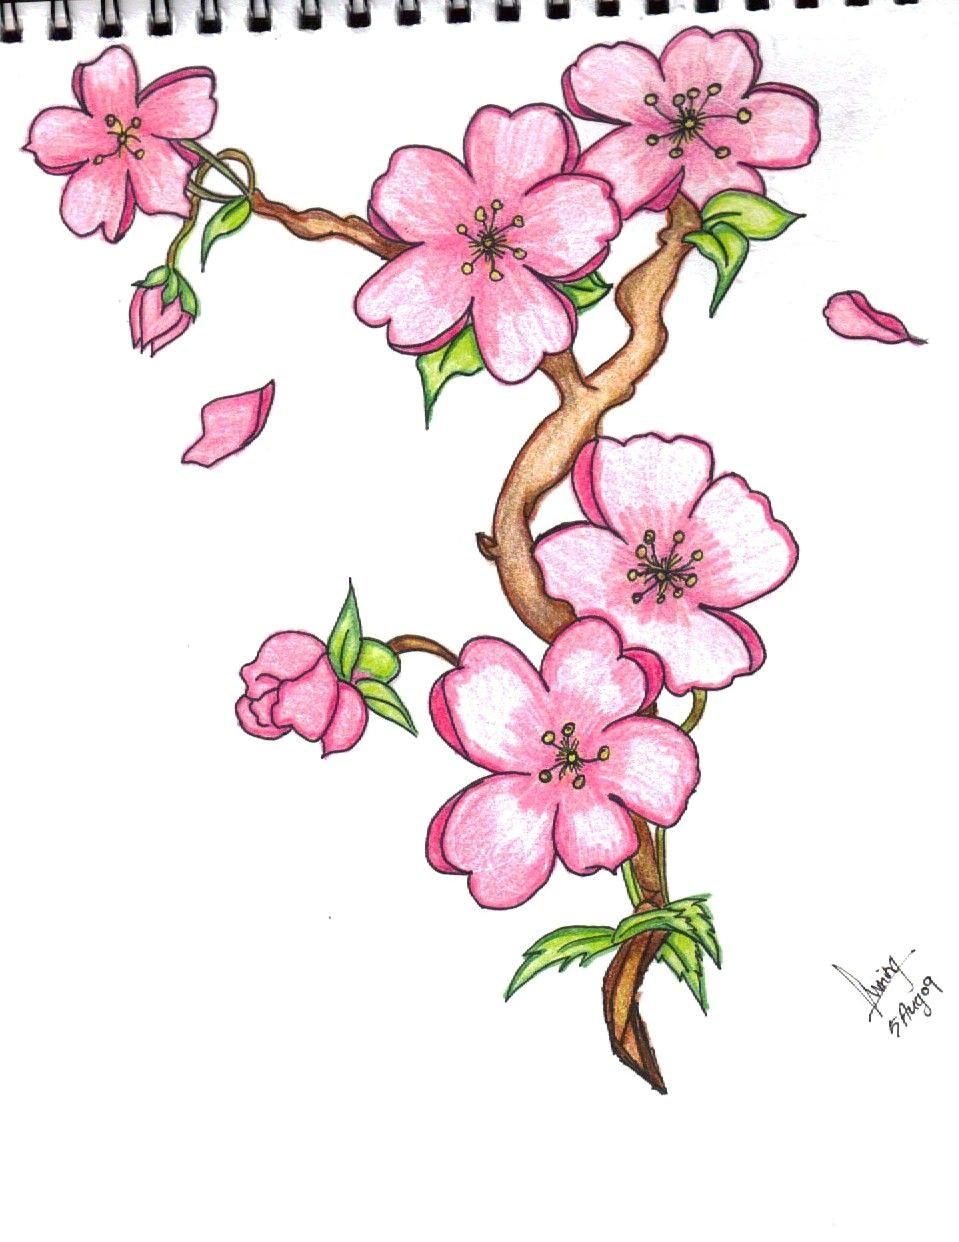 drawing plants and flowers ile ilgili gorsel sonucu